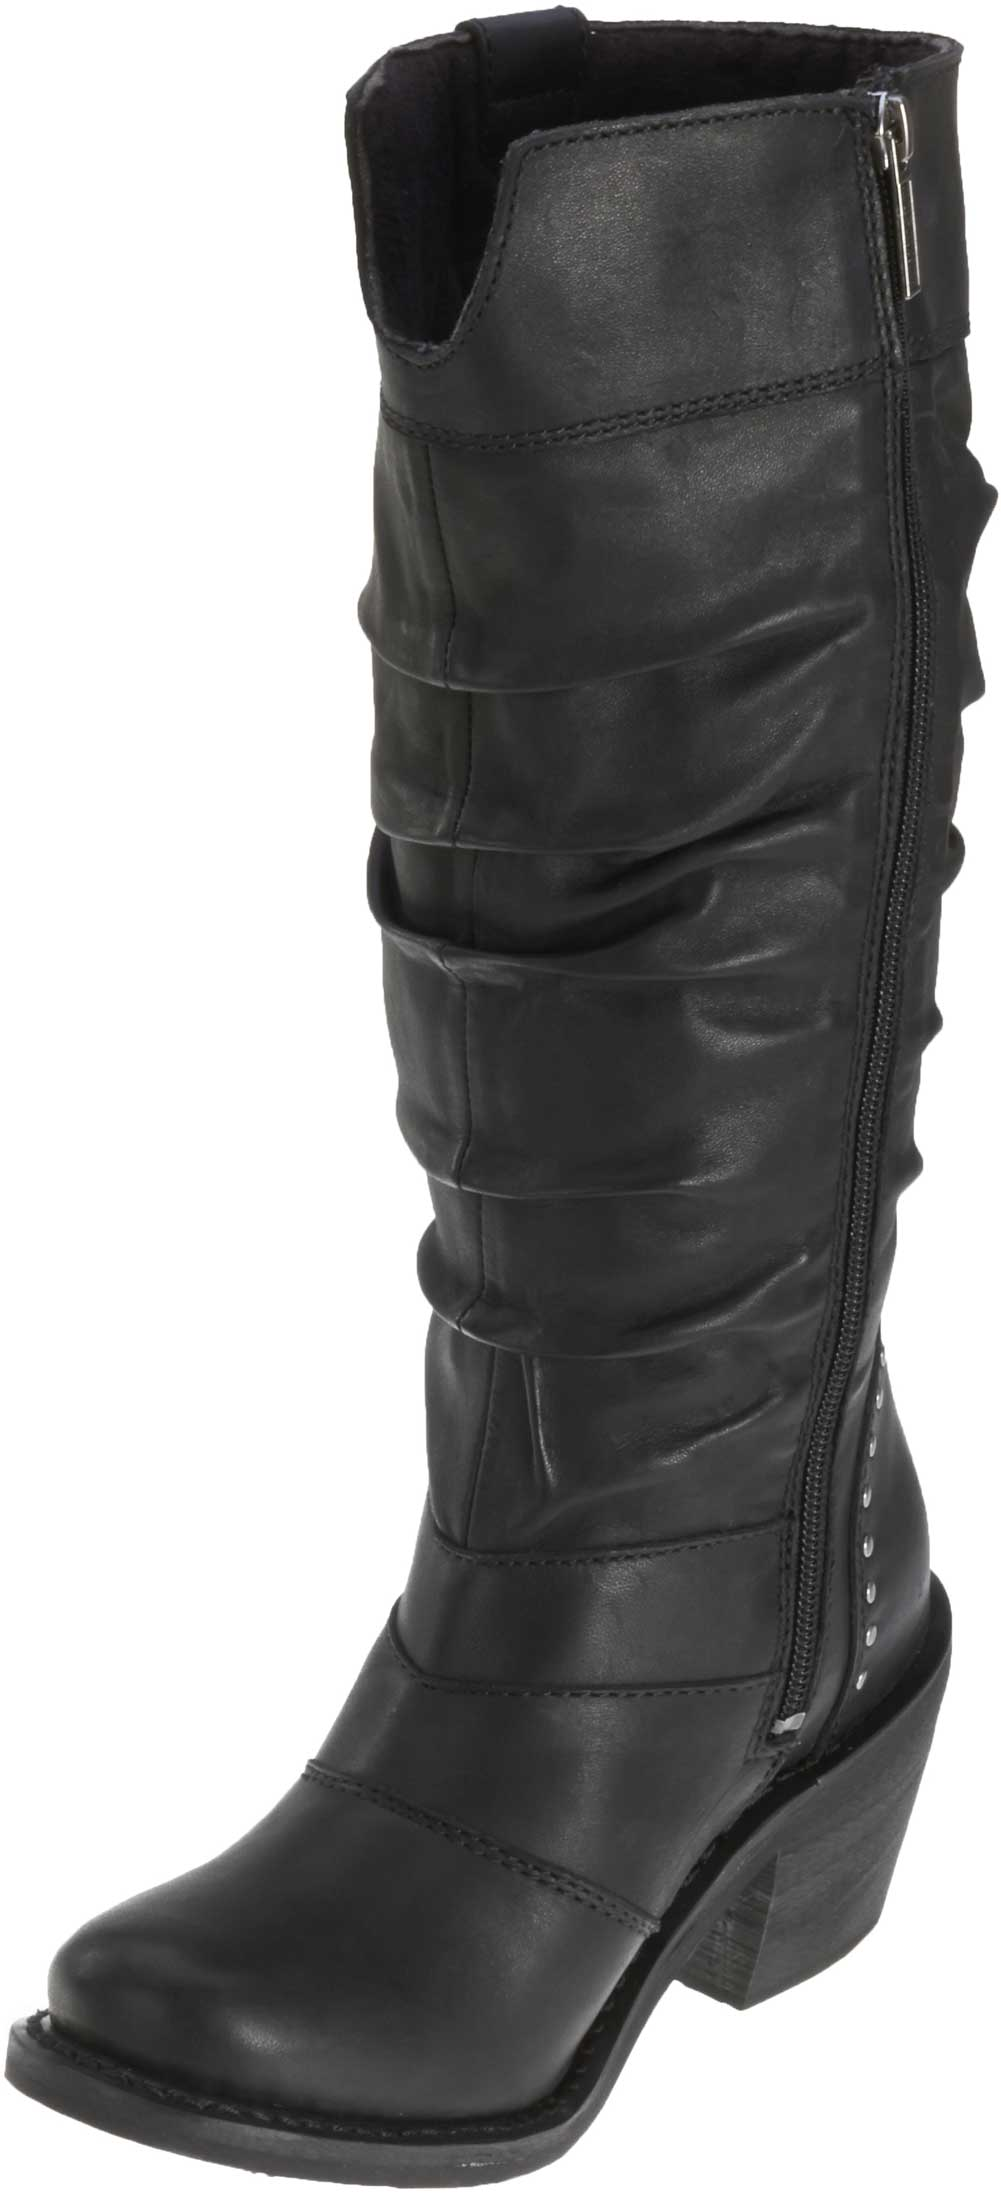 78cfe4fb2fc Harley-Davidson Women s Jana Black Boots. 13-Inch Shaft